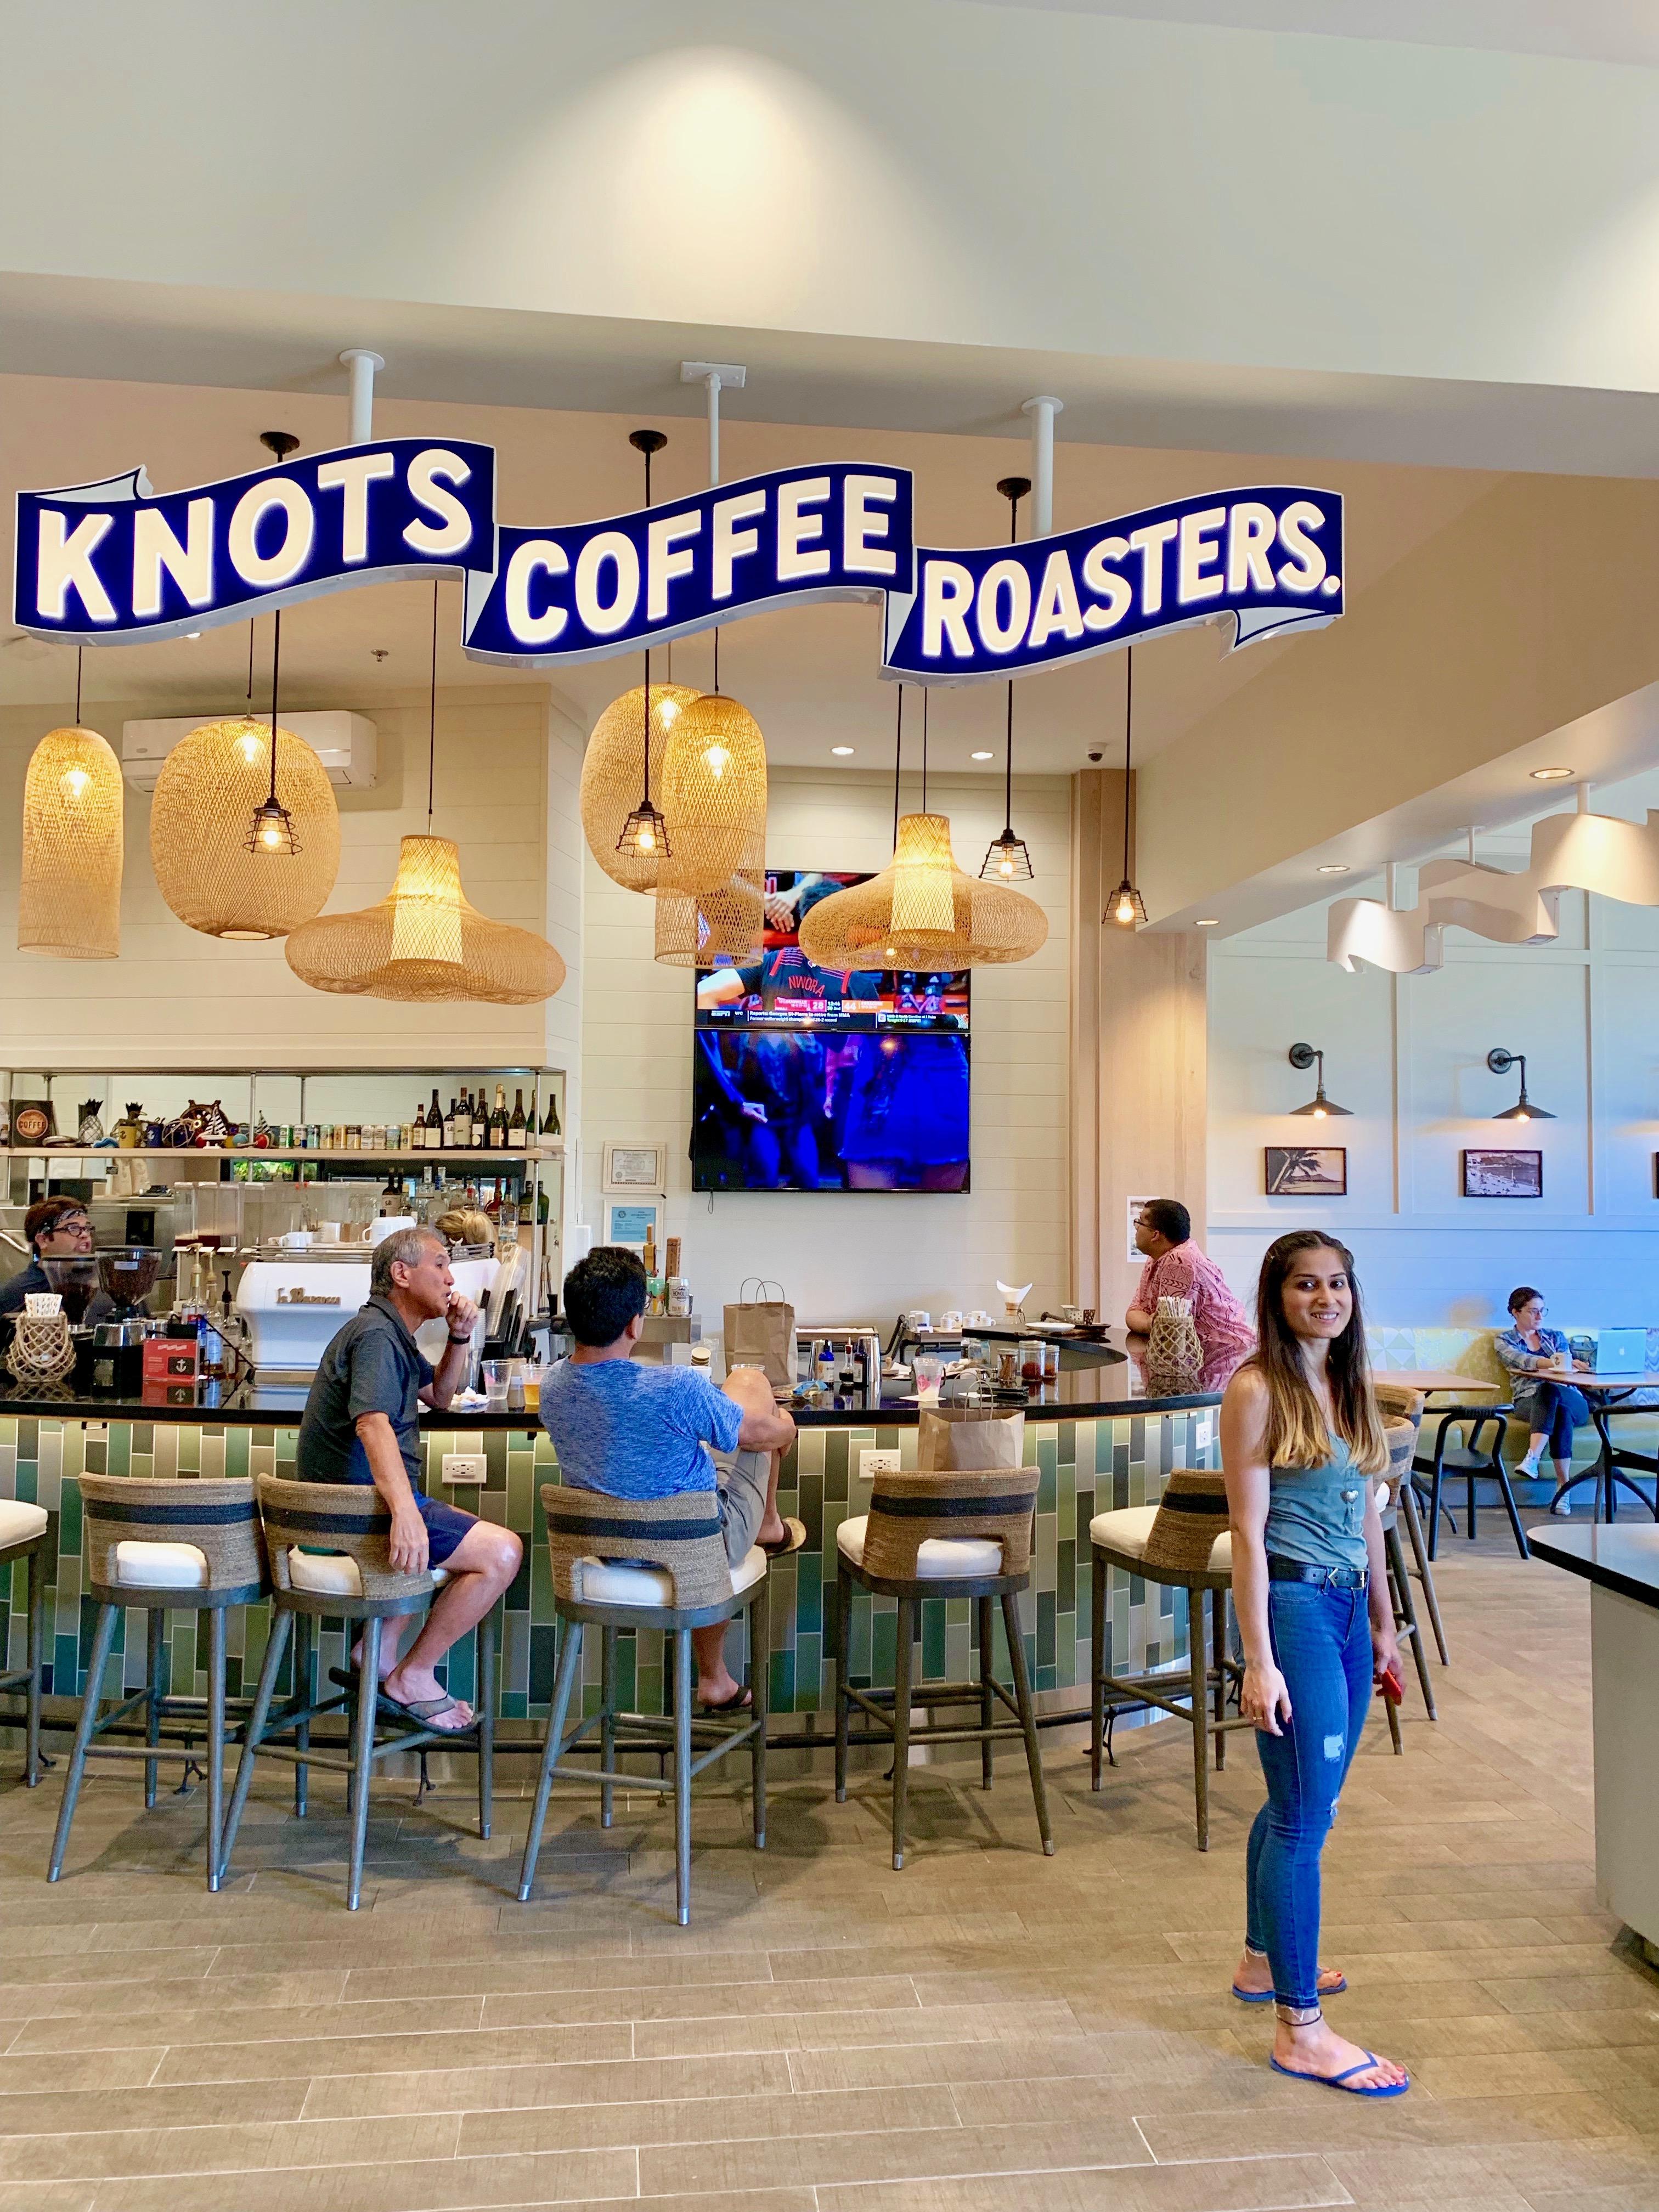 honolulu waikiki hawaii hotel review queen kapiolani exterior lobby interiors knots coffee roasters